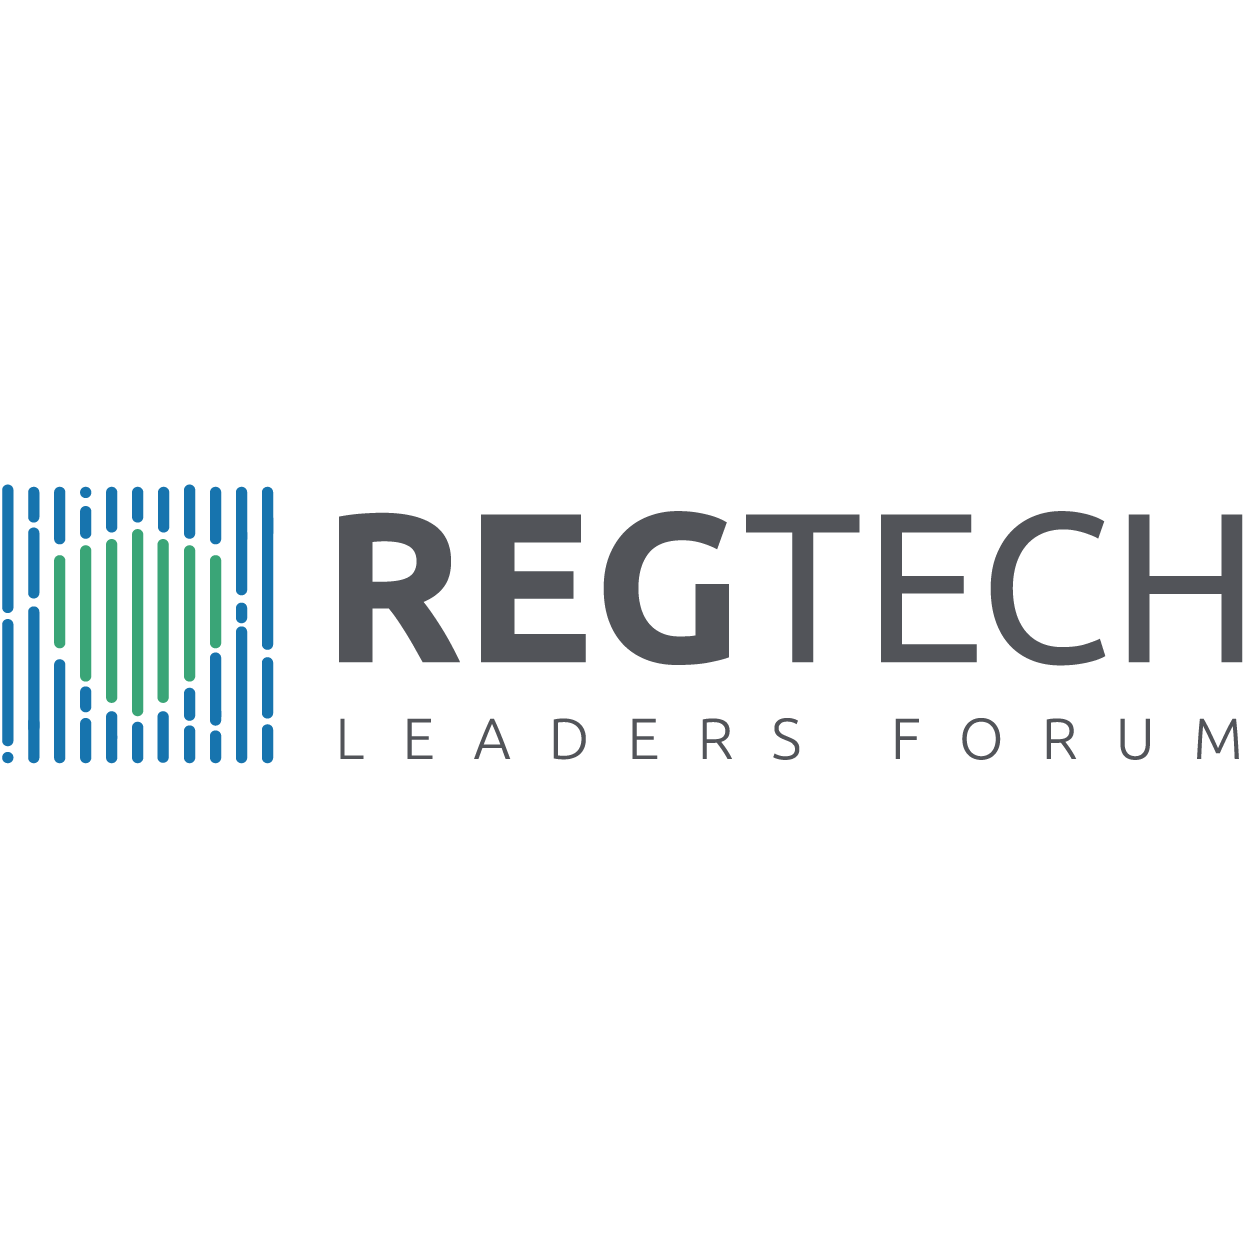 NPF Regtech Leaders Forum: Building a Network of Industry Influencers